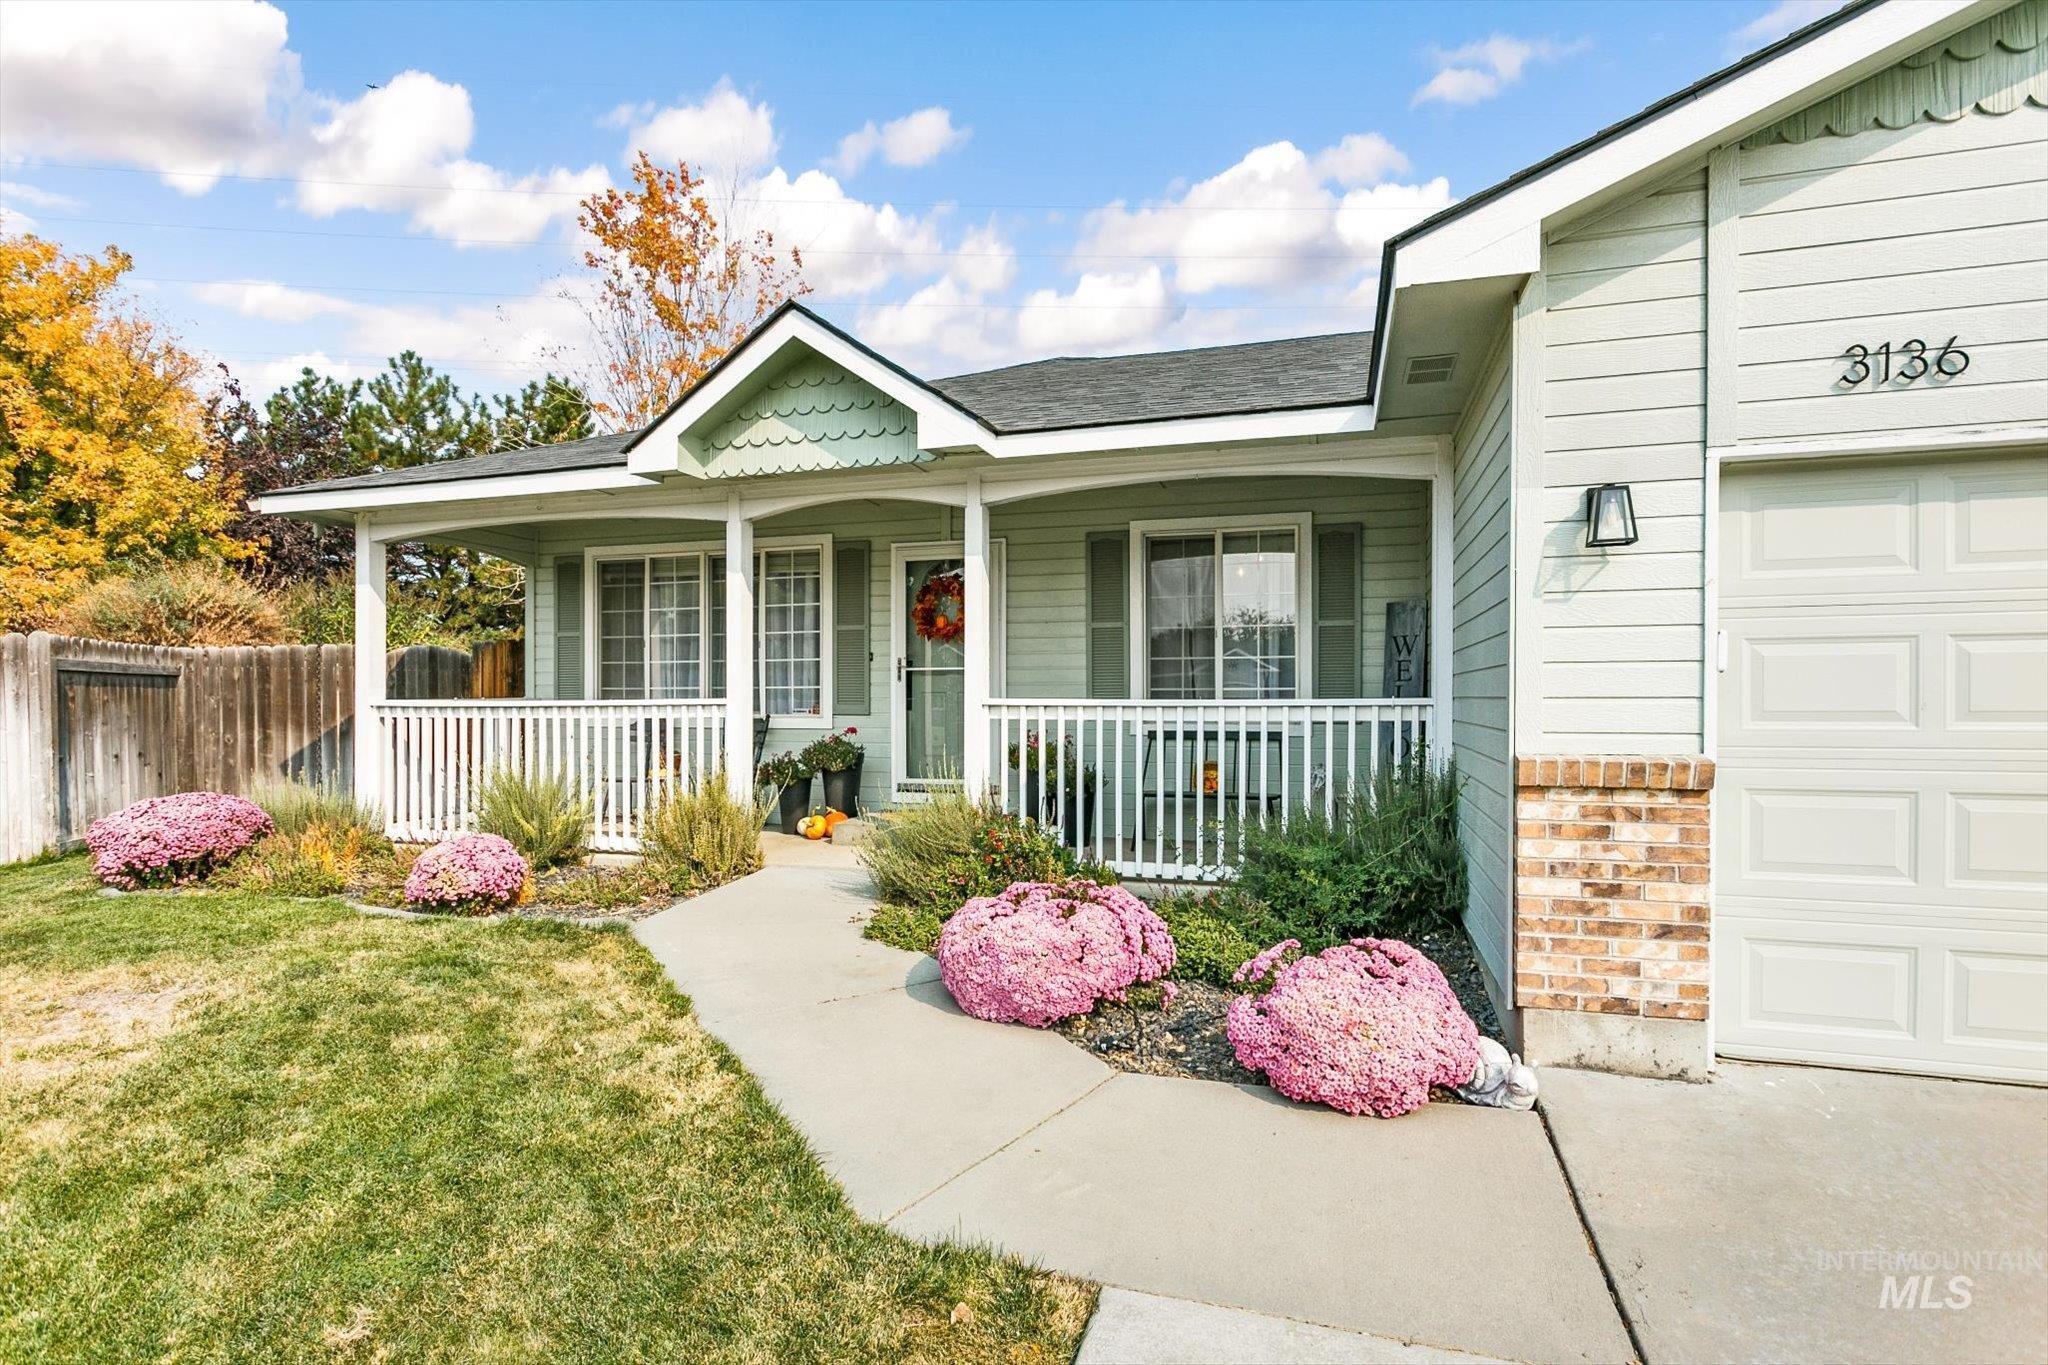 3136 N Burley Pl Property Photo